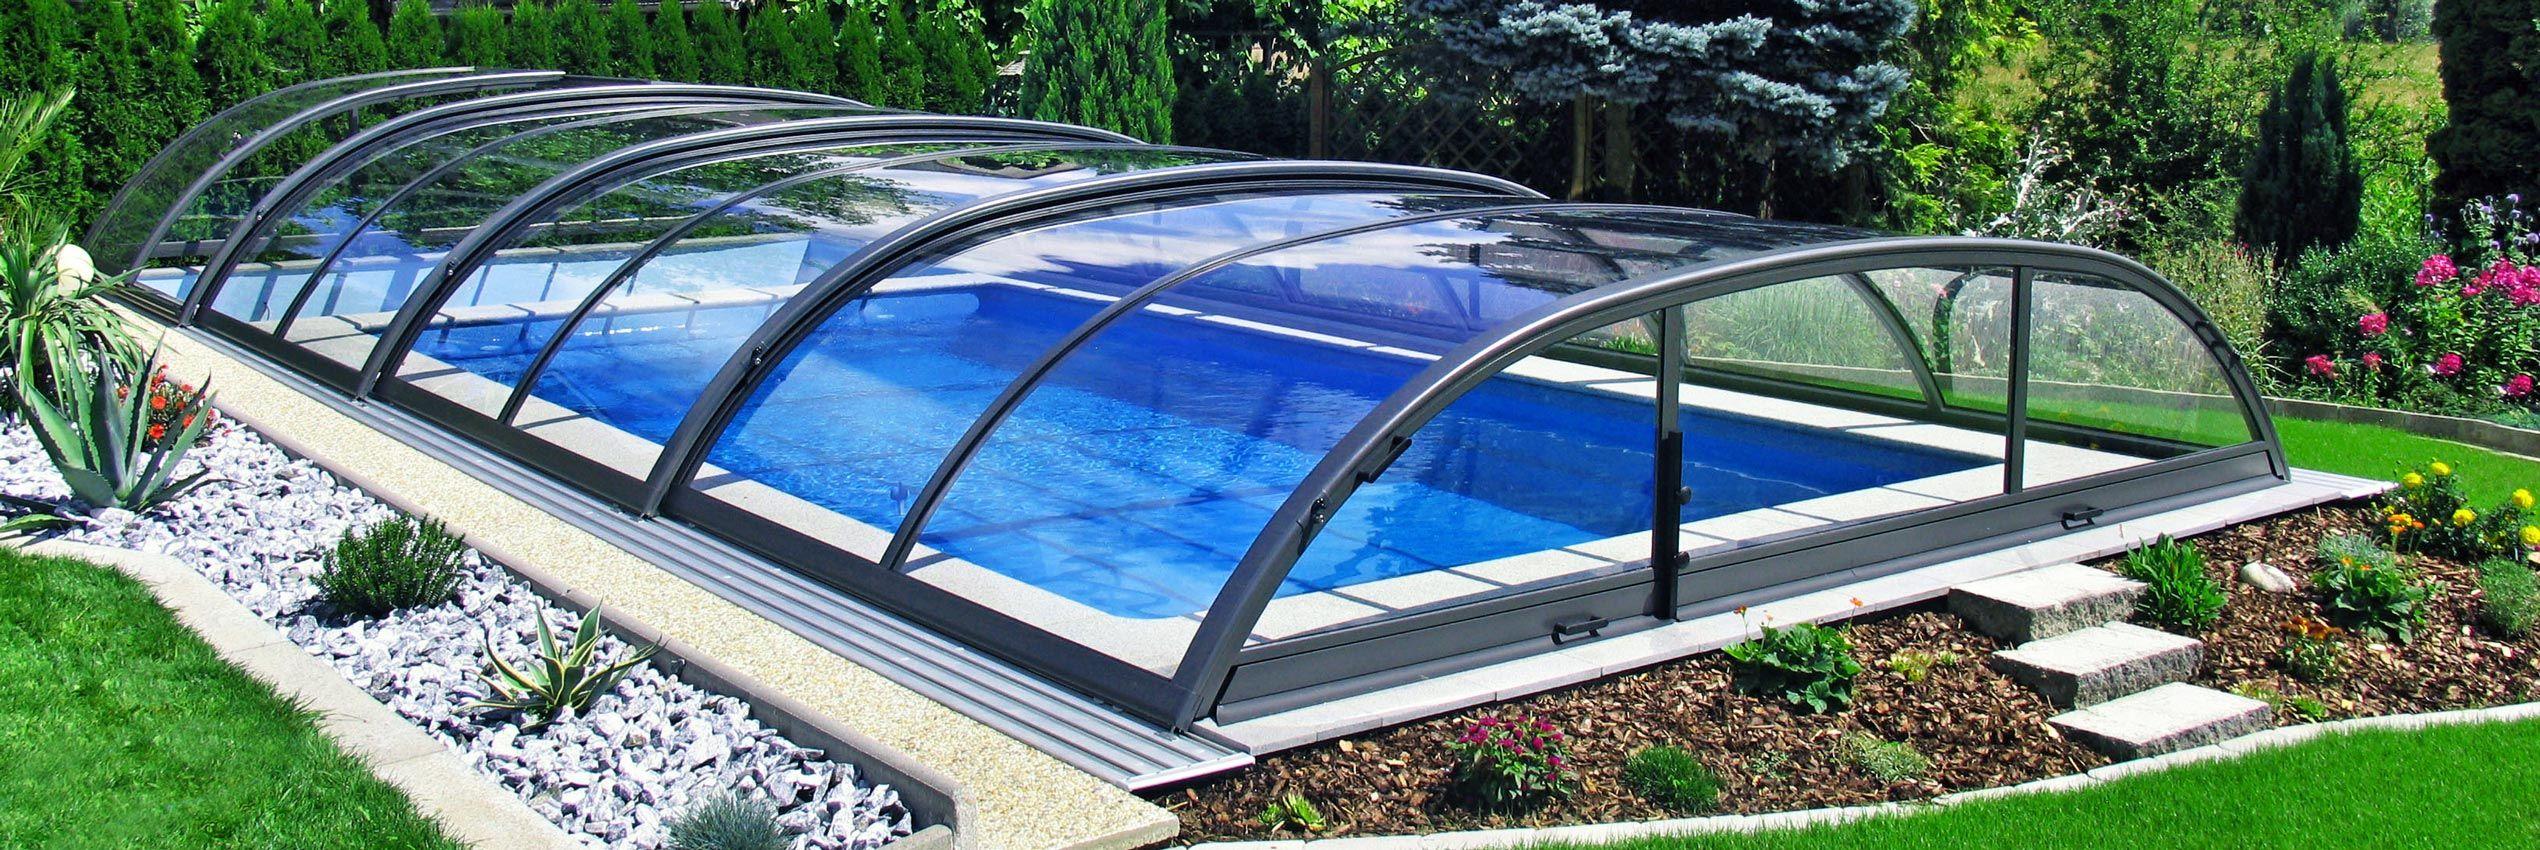 Acoperire piscina Inchisa - Elegant Neo